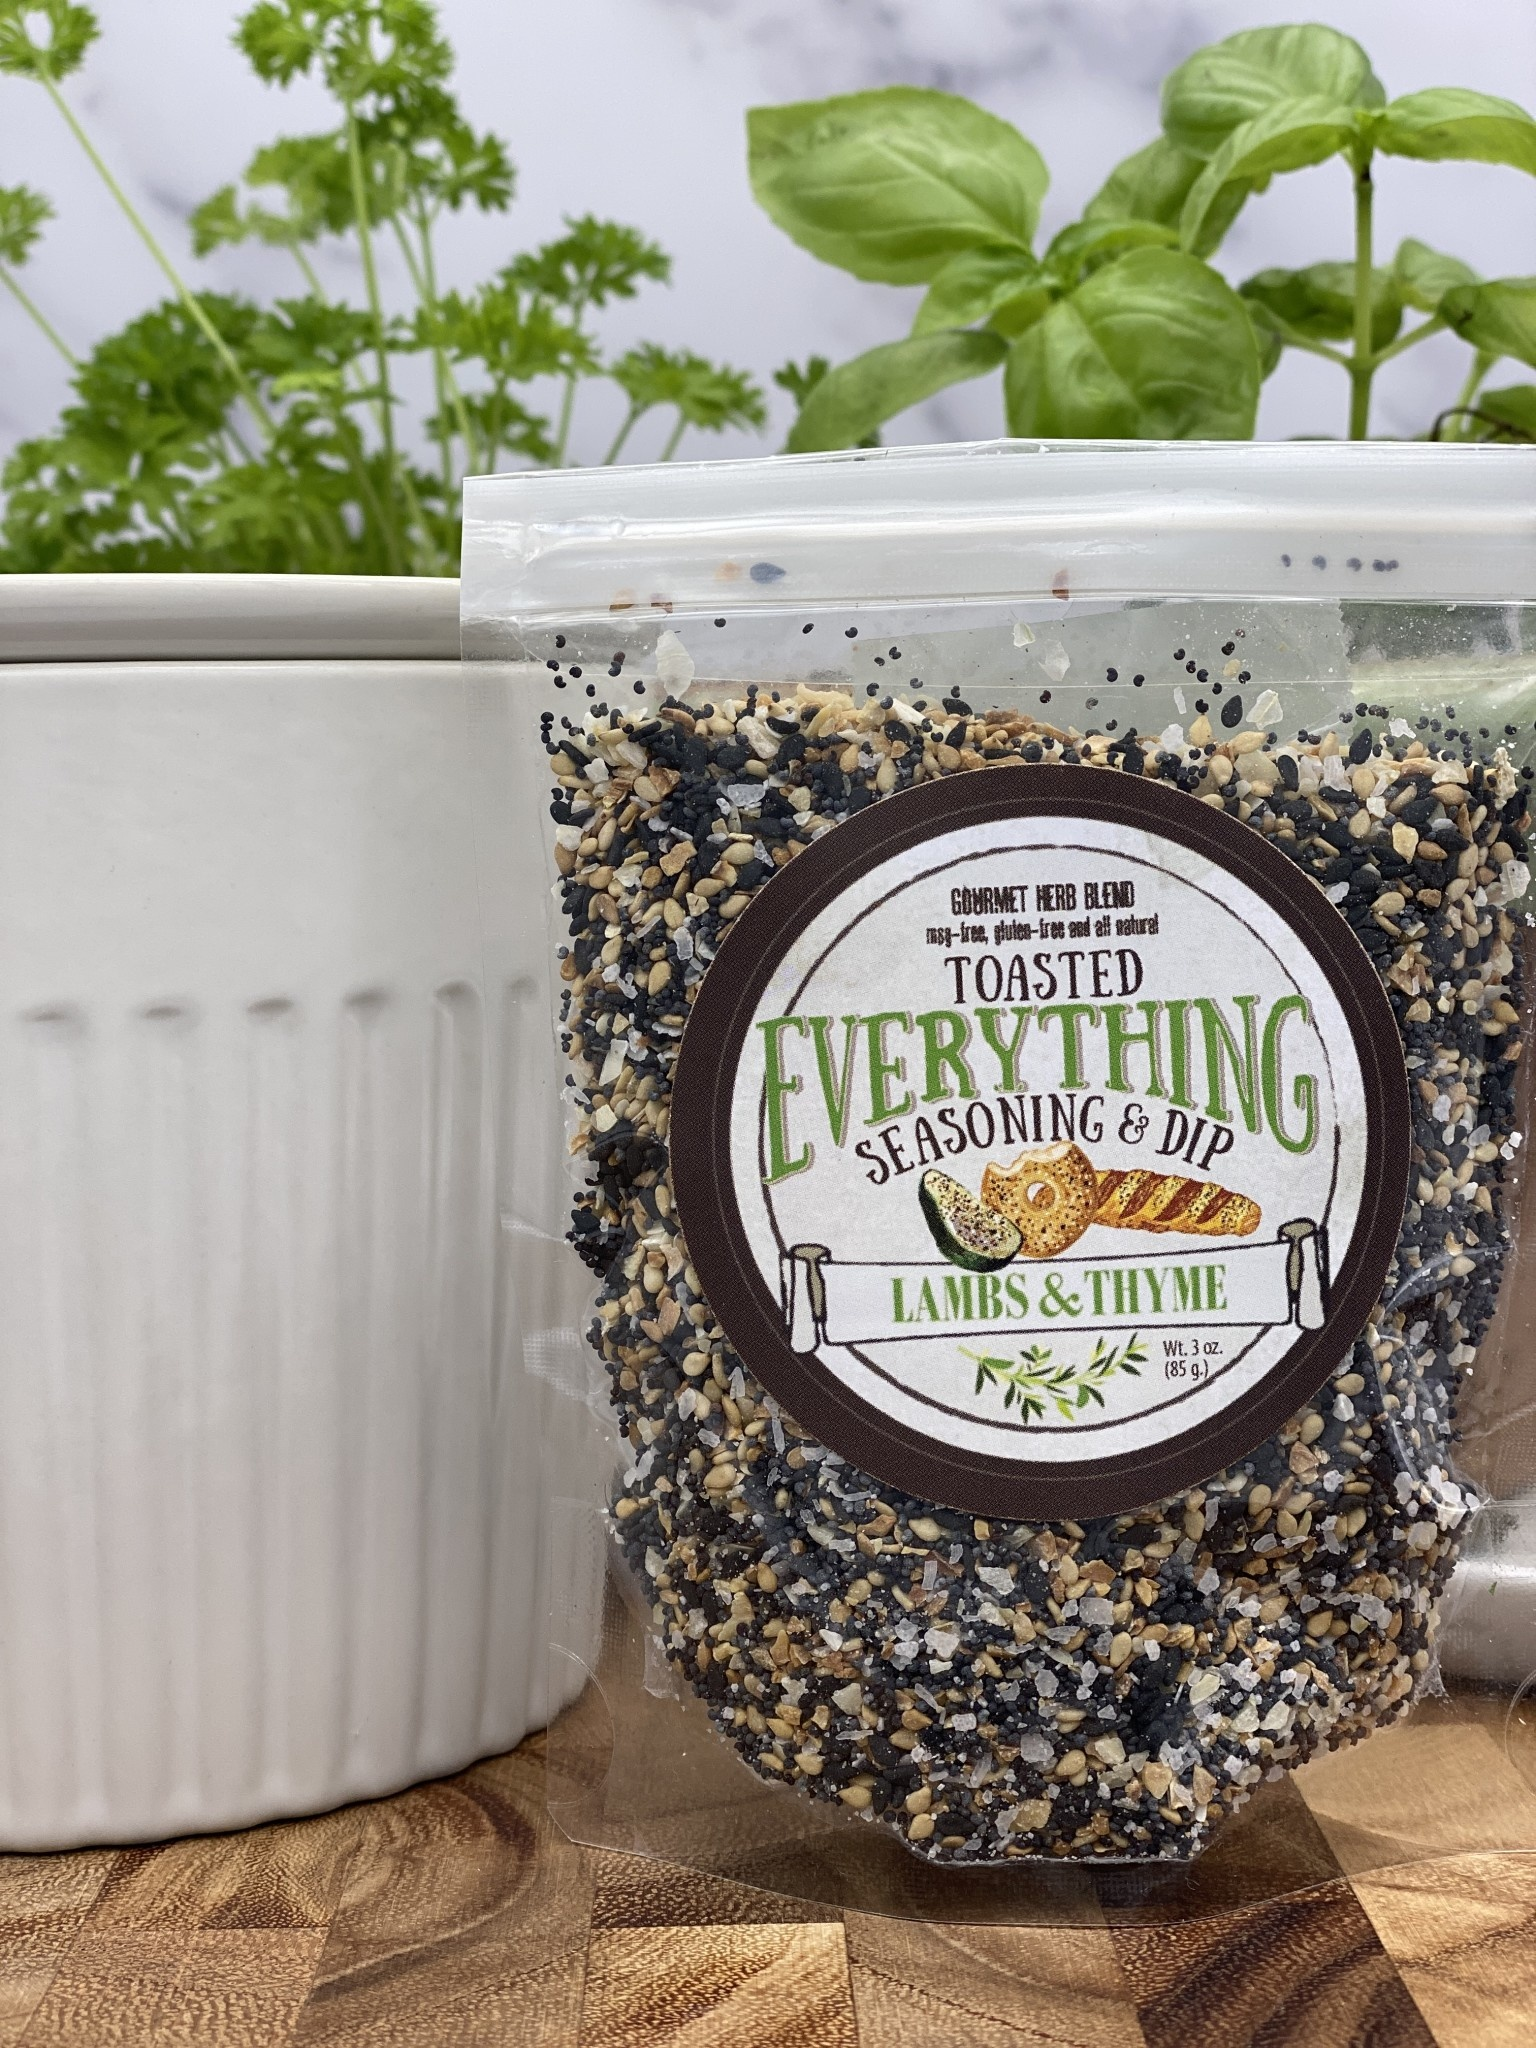 Lambs & Thyme Everything Seasoning and Dip